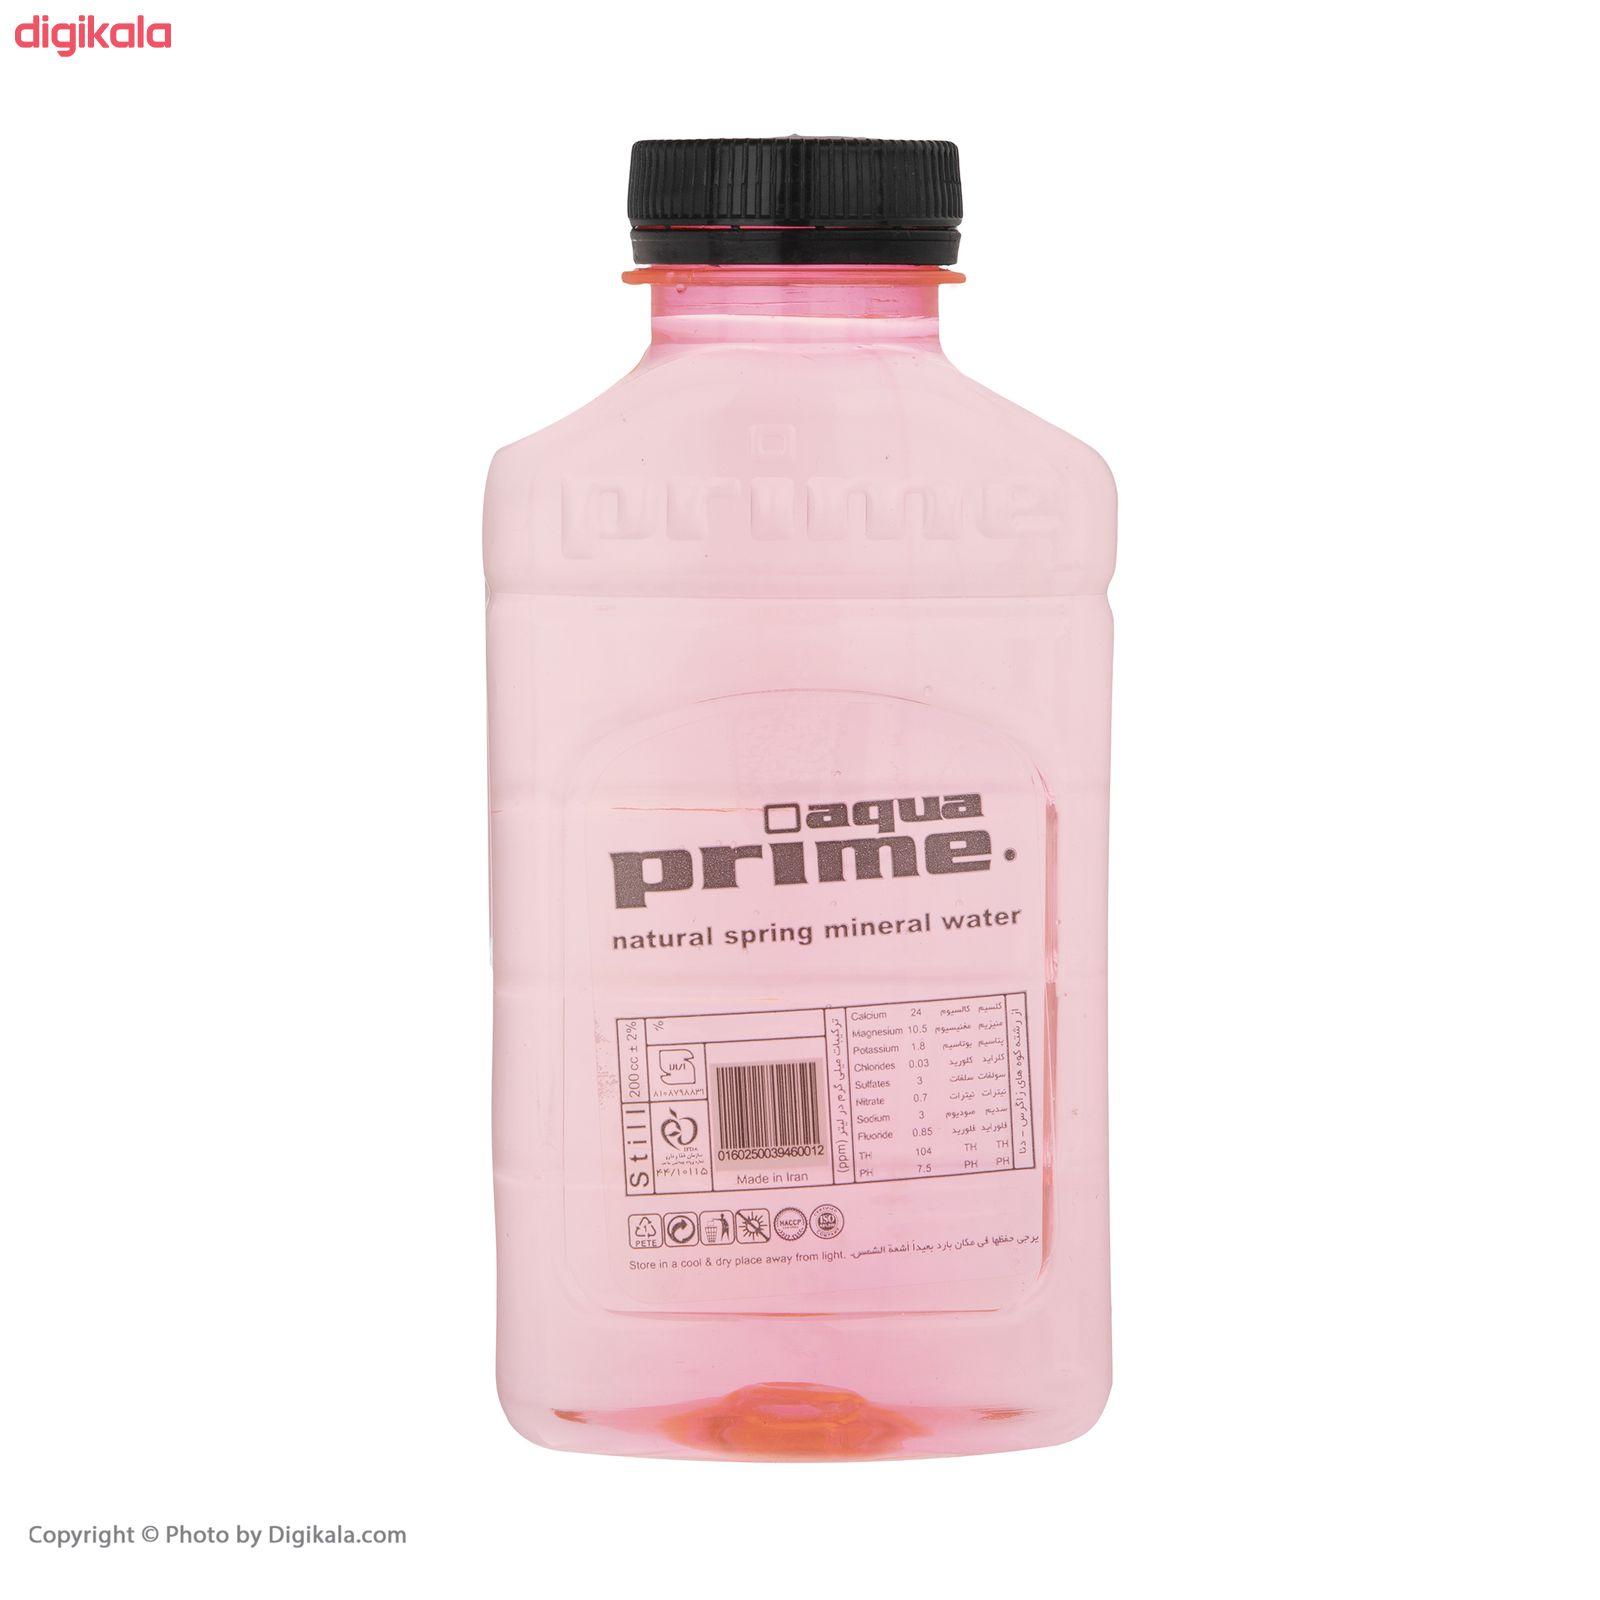 آب معدنی آکوا پرایم - 200 میلی لیتر بسته 18 عددی main 1 5